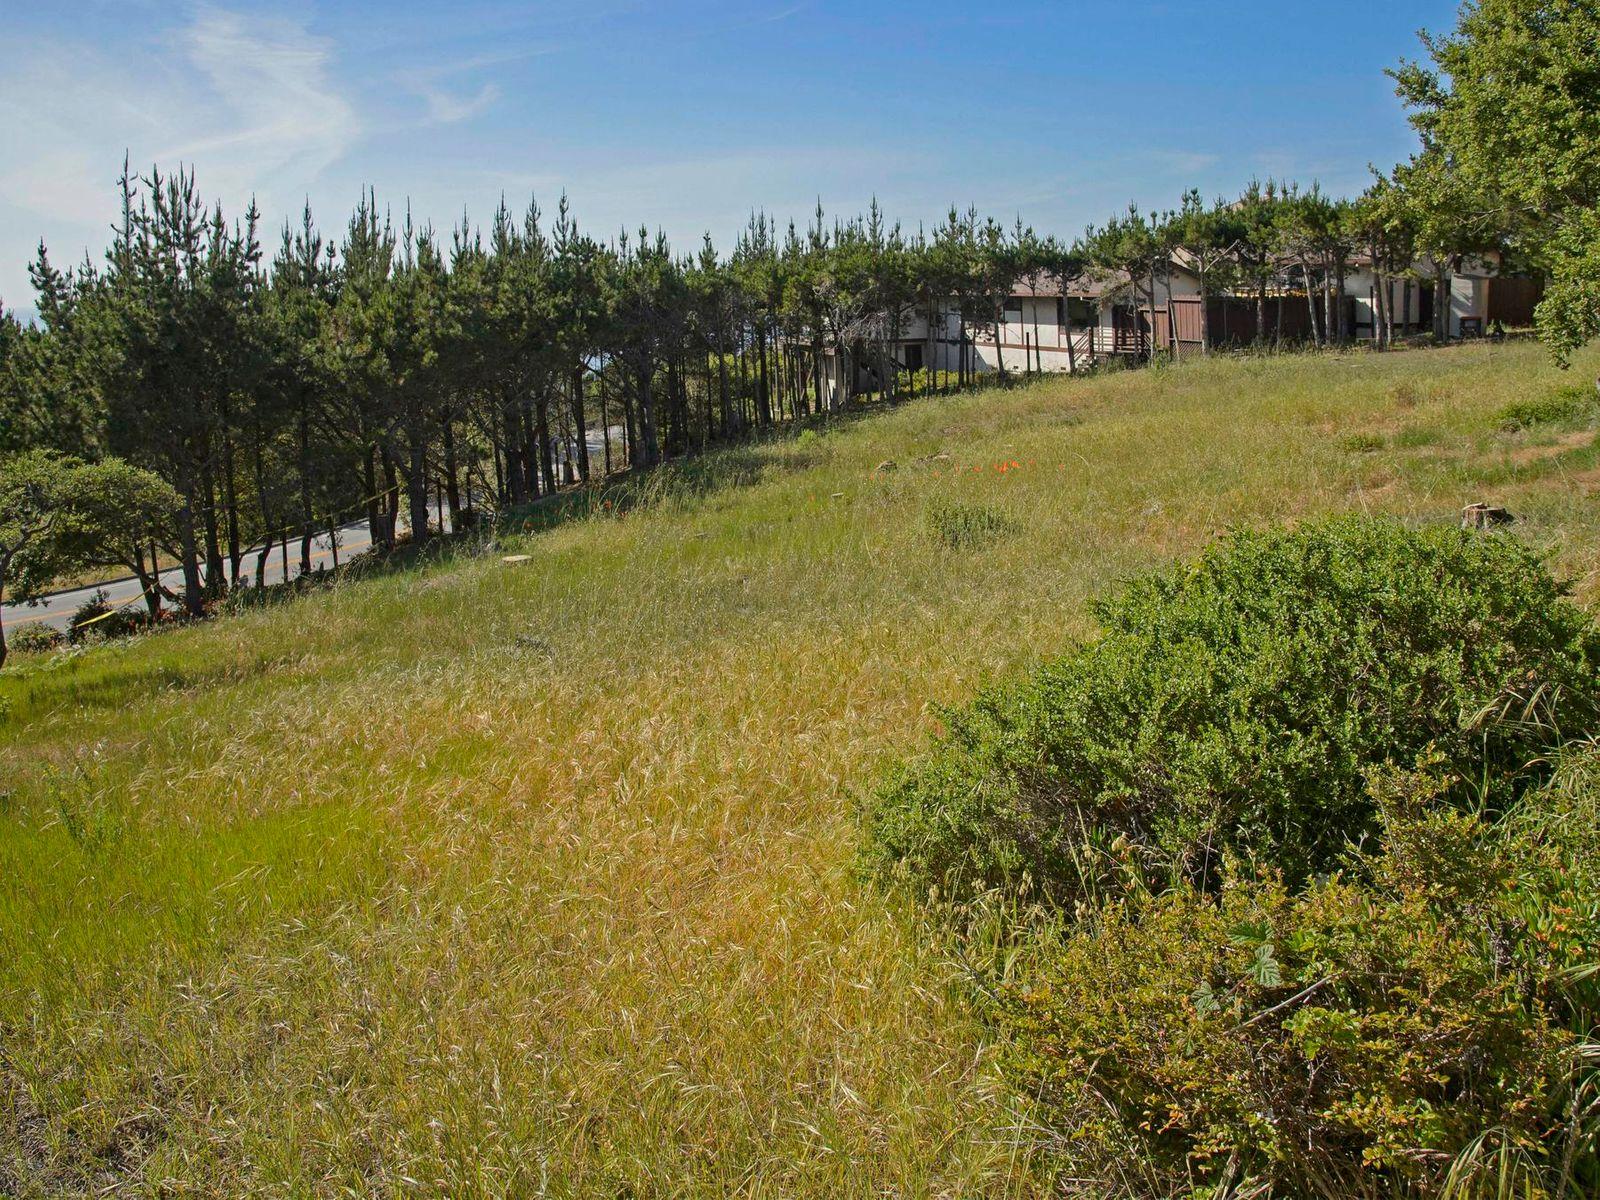 Sensational Pebble Beach Lot with Plans